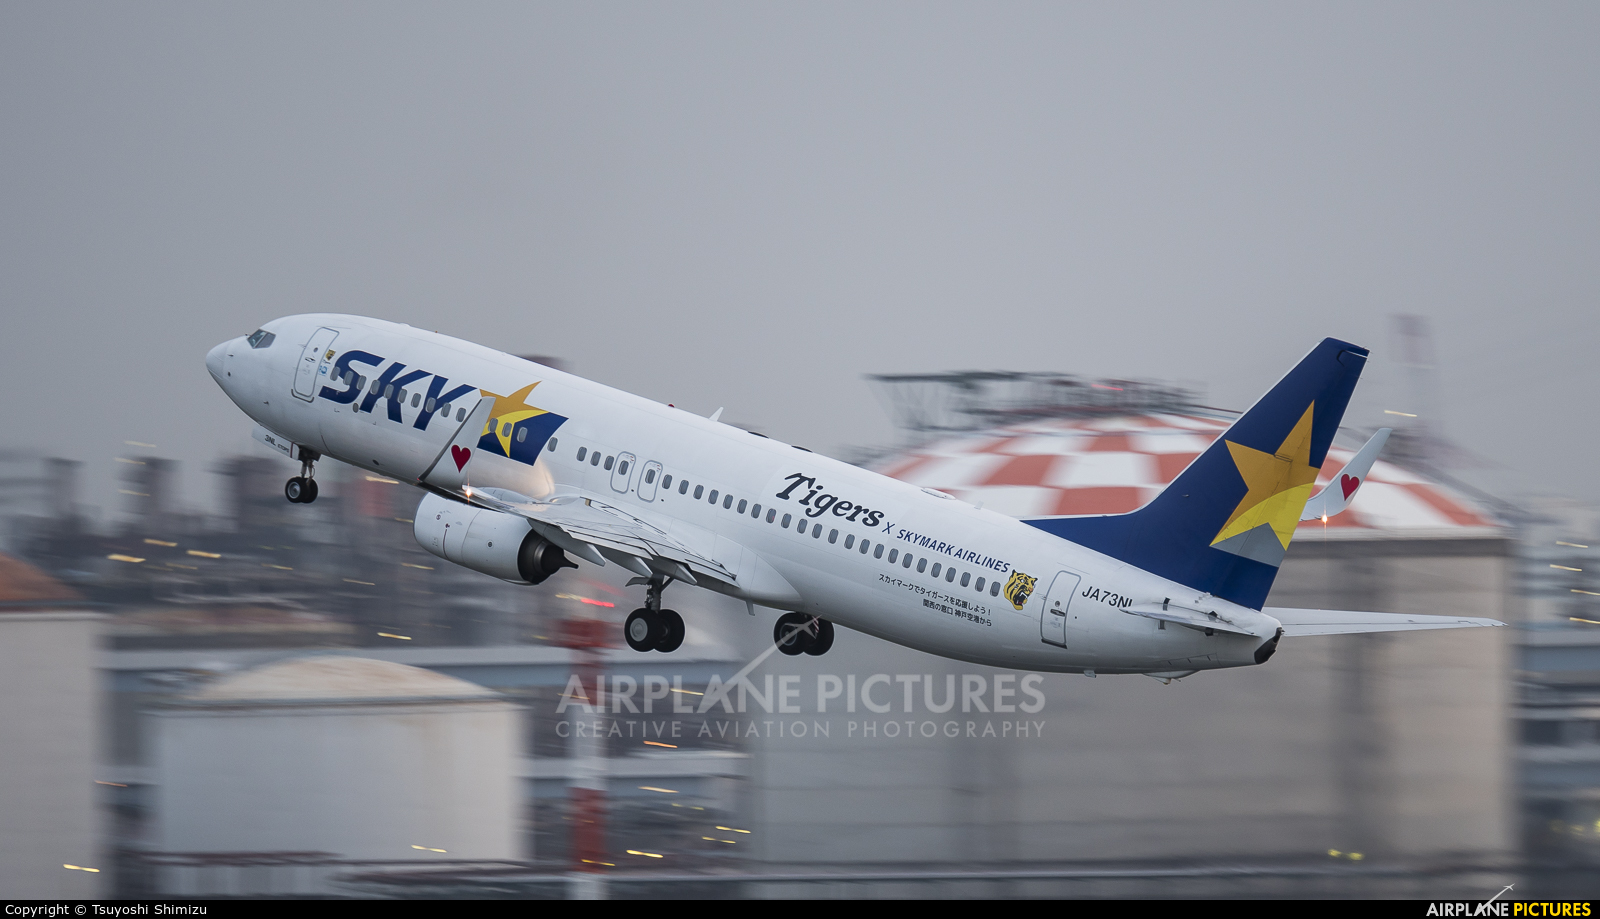 Skymark Airlines JA73NL aircraft at Tokyo - Haneda Intl